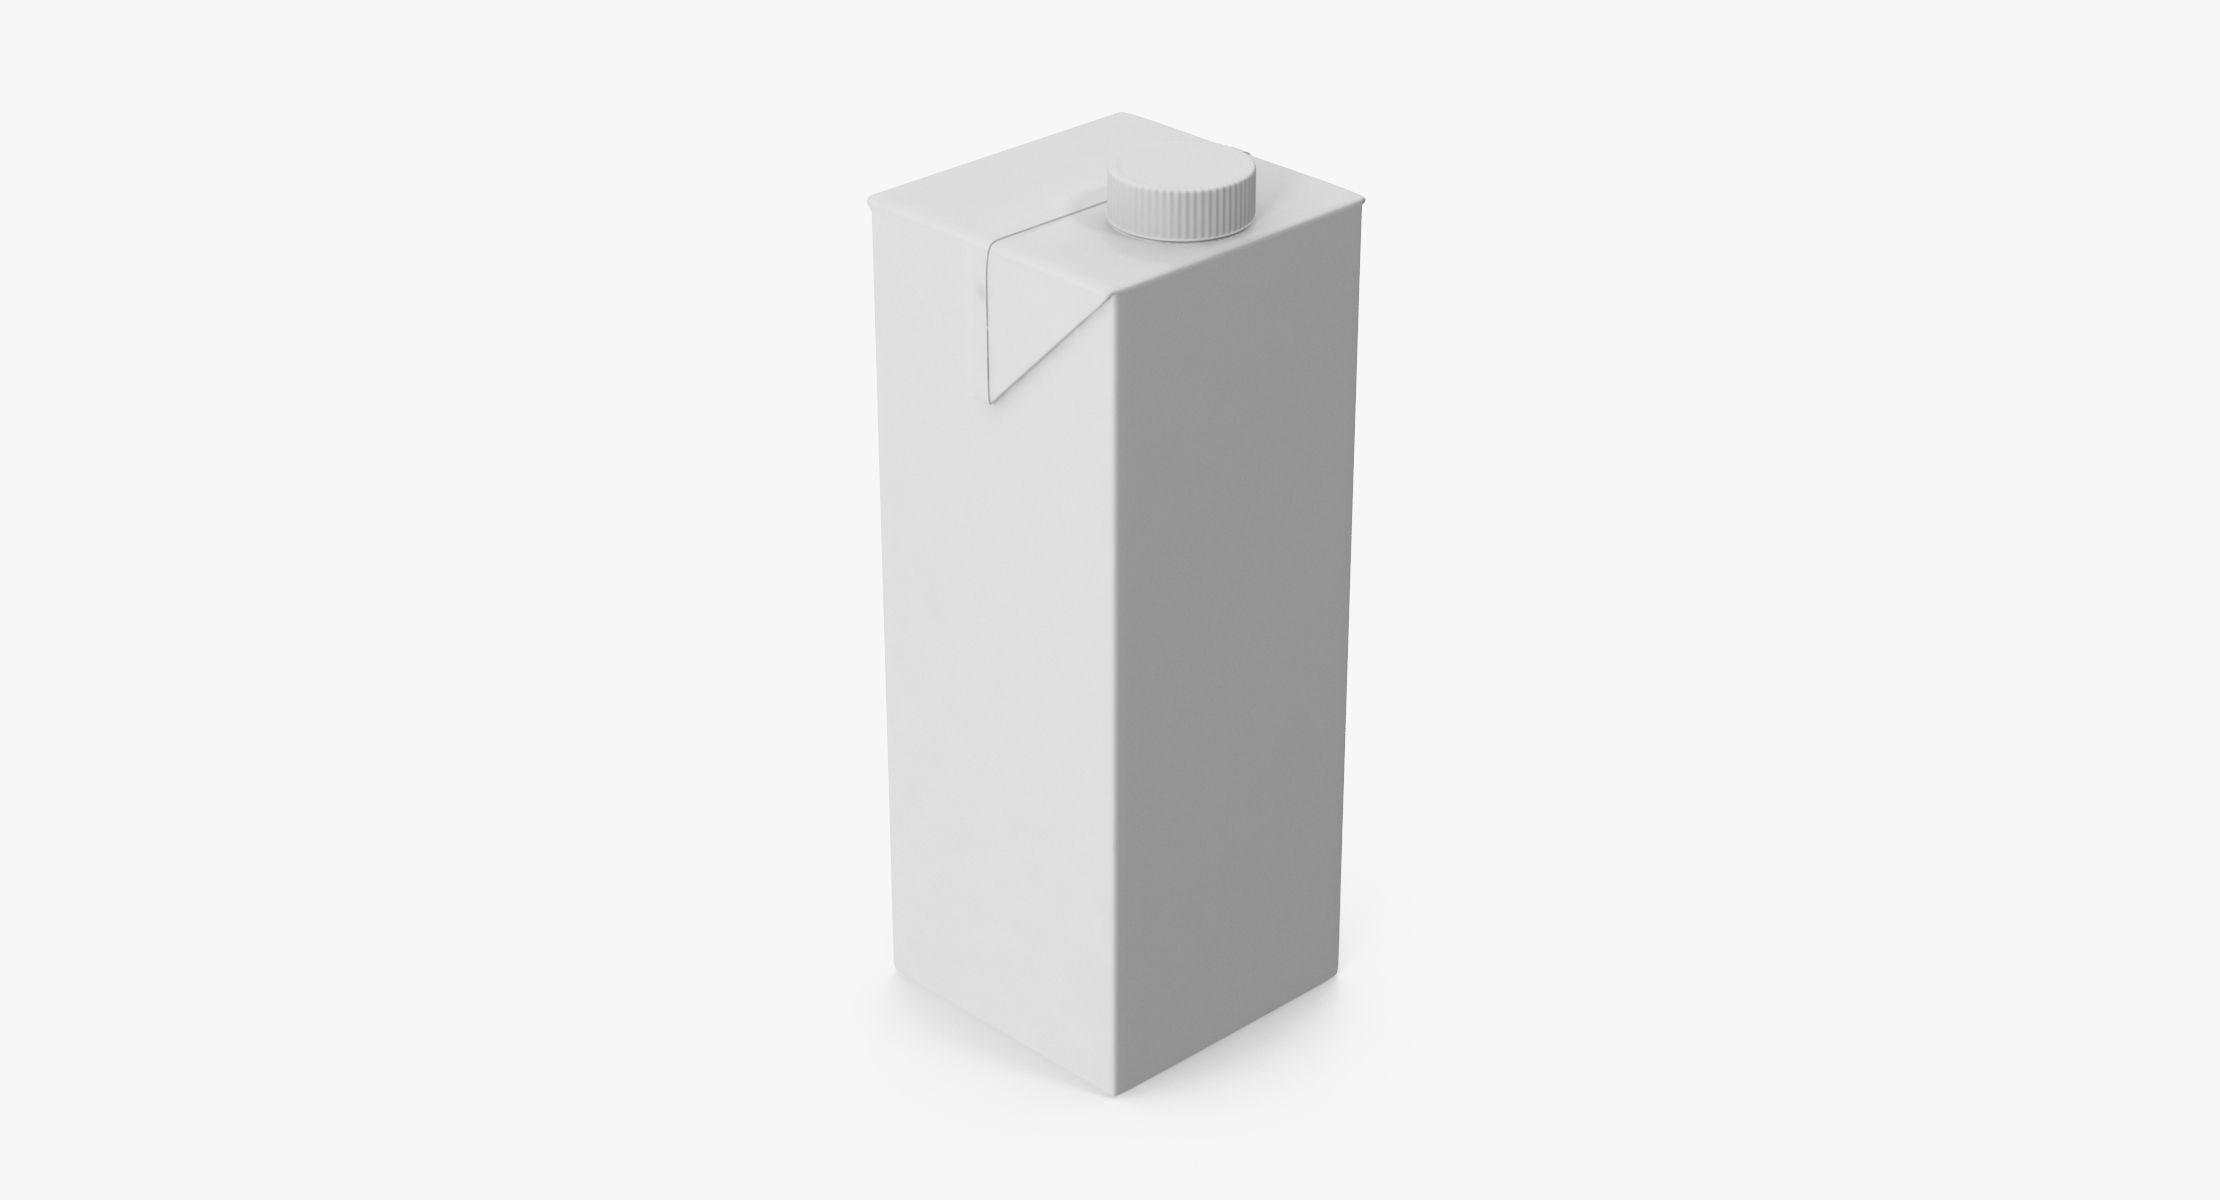 Screw Top Carton Container - reel 1